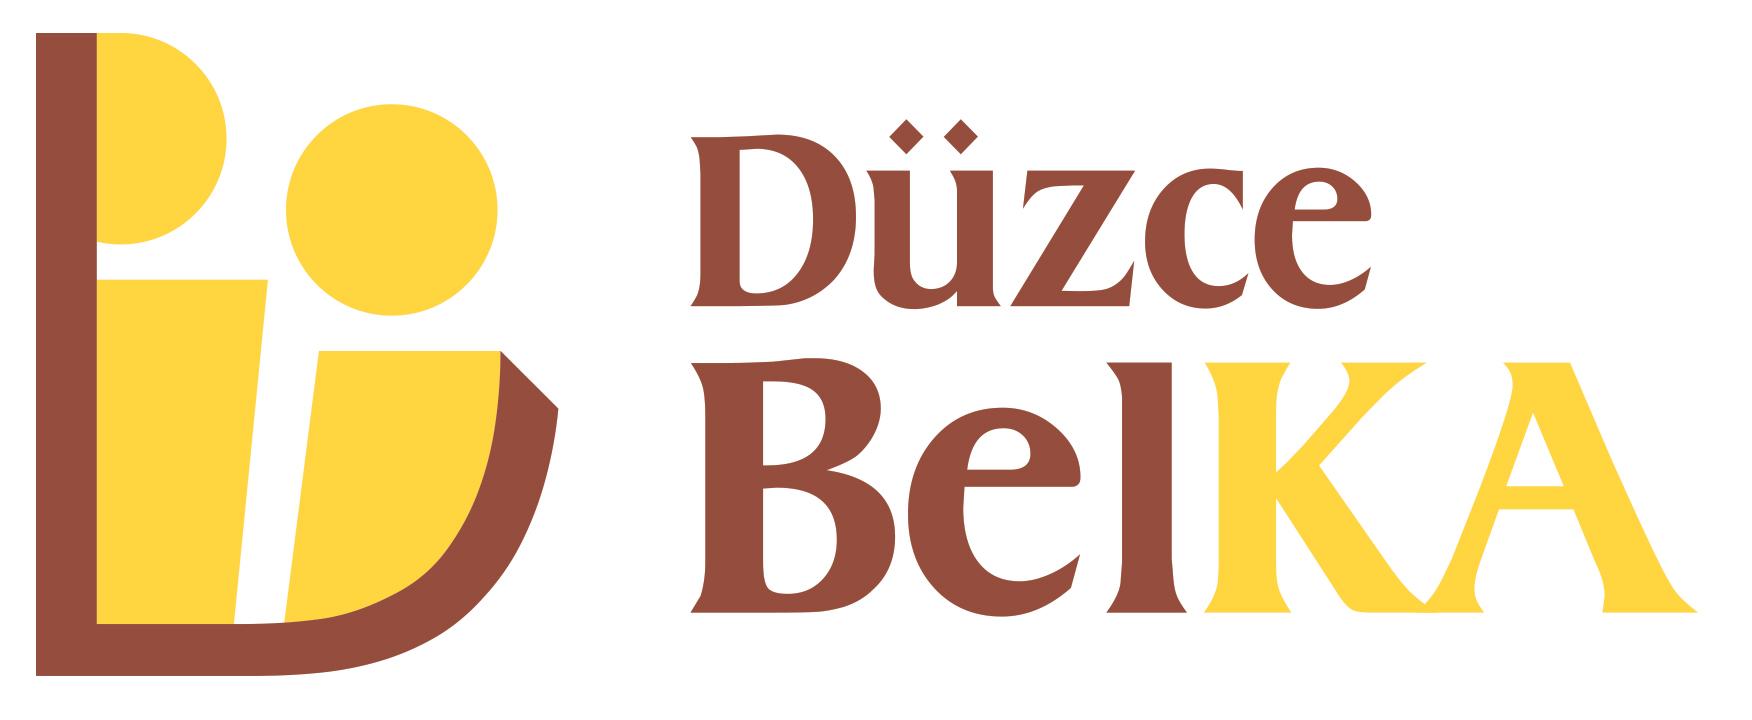 https://duzcebelka.com.tr/wp-content/uploads/2020/03/DüzceBelka-logo.jpg